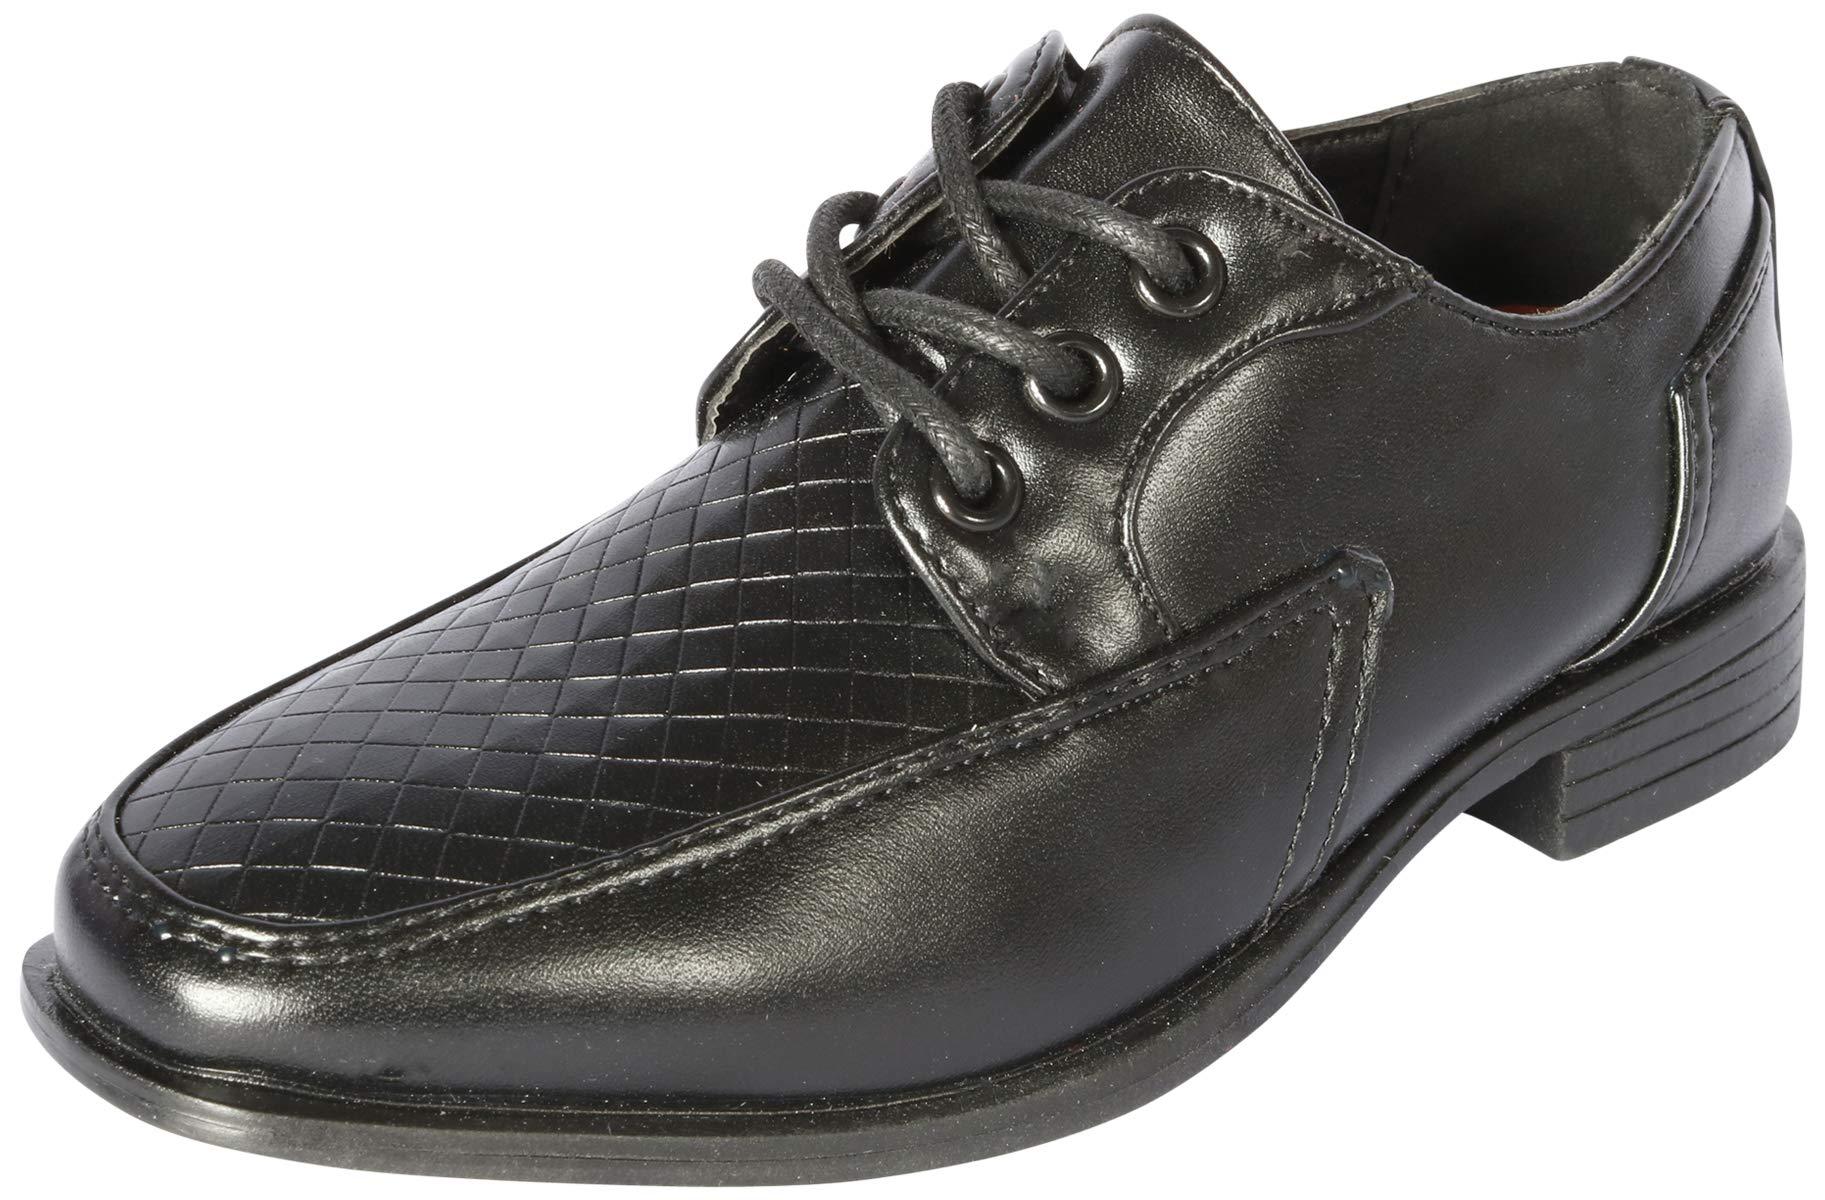 Jodano Collection Boys Memory Foam Lace up Dress Shoe, Black, 8 M US Big Kid'